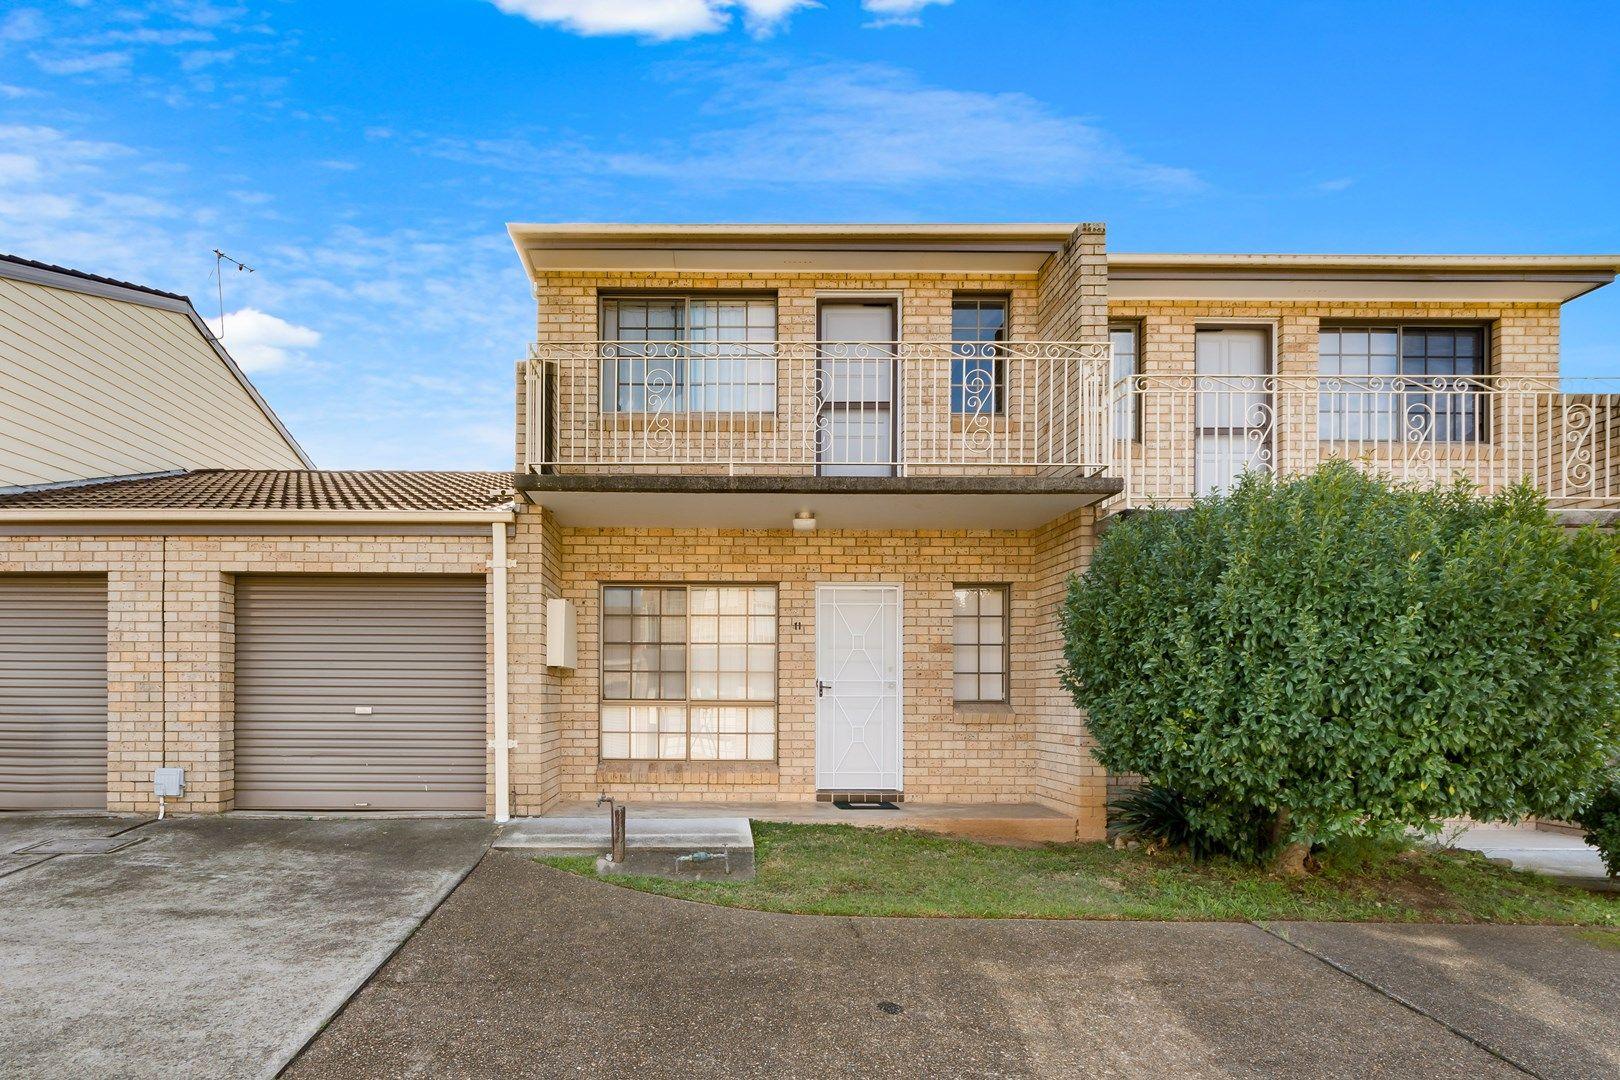 11/17 Lagonda Drive, Ingleburn NSW 2565, Image 0